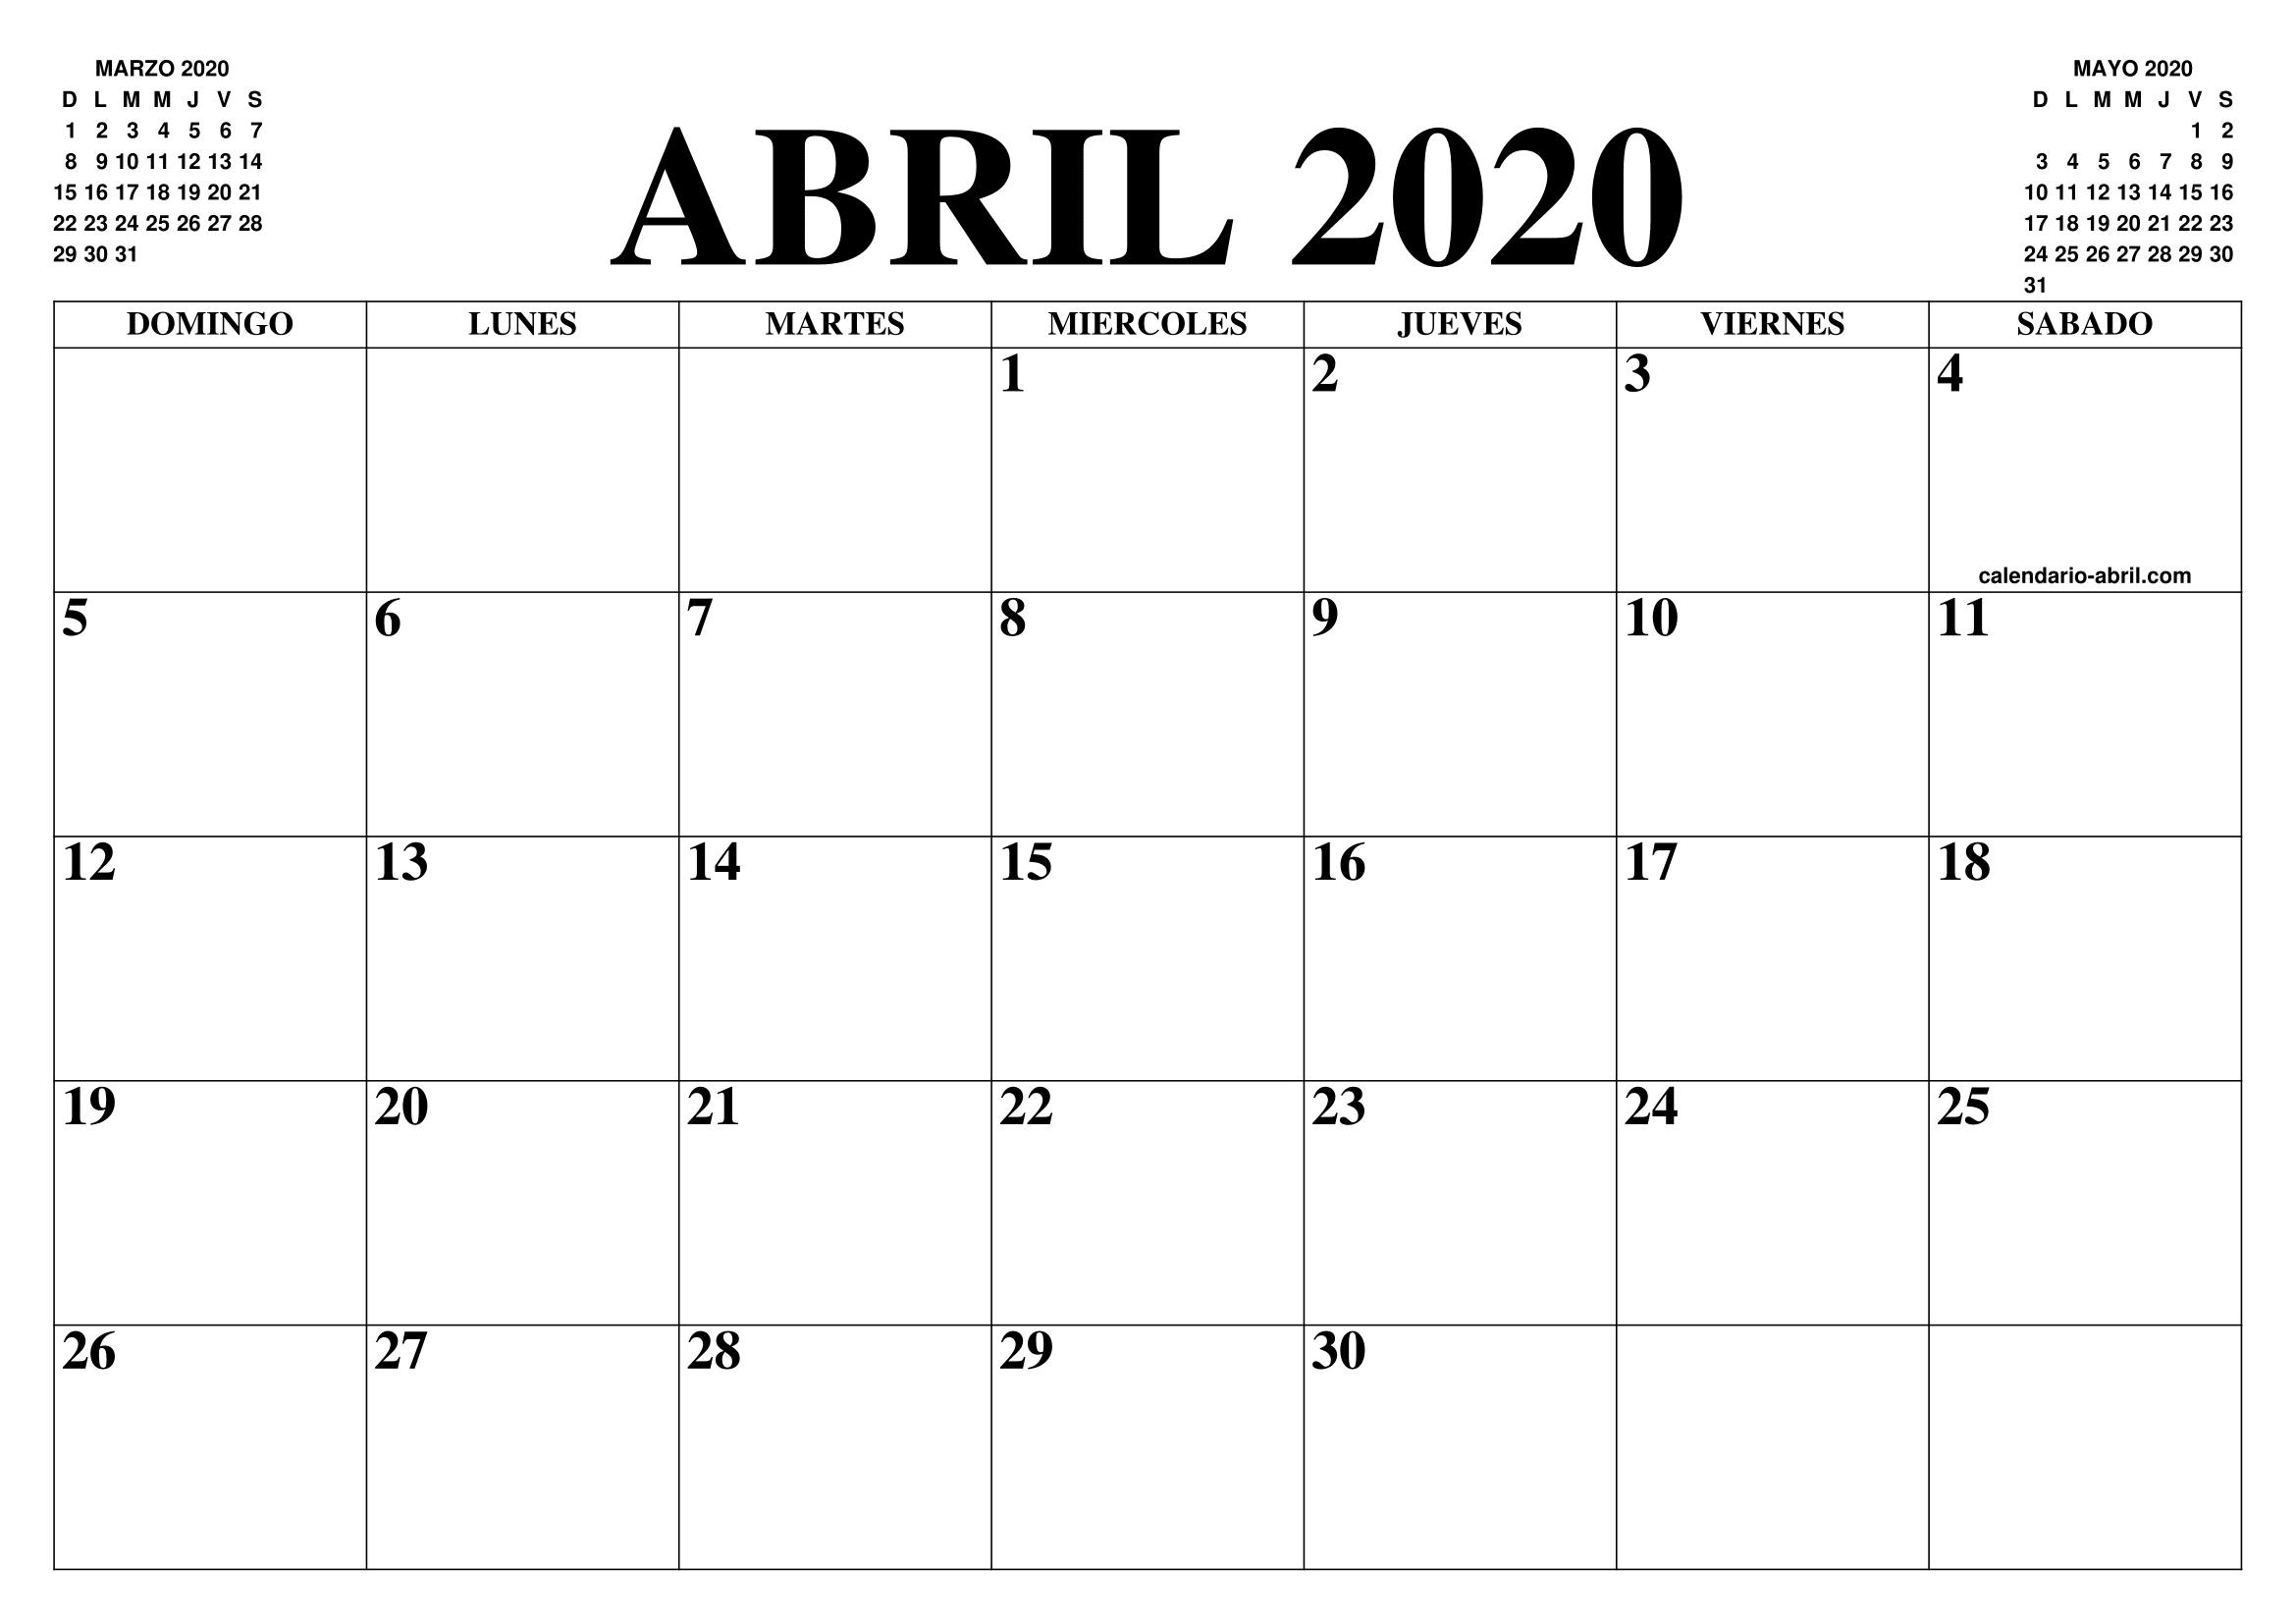 Calendario Mes De Octubre 2020 Para Imprimir.Calendario Abril 2020 El Calendario Abril Para Imprimir